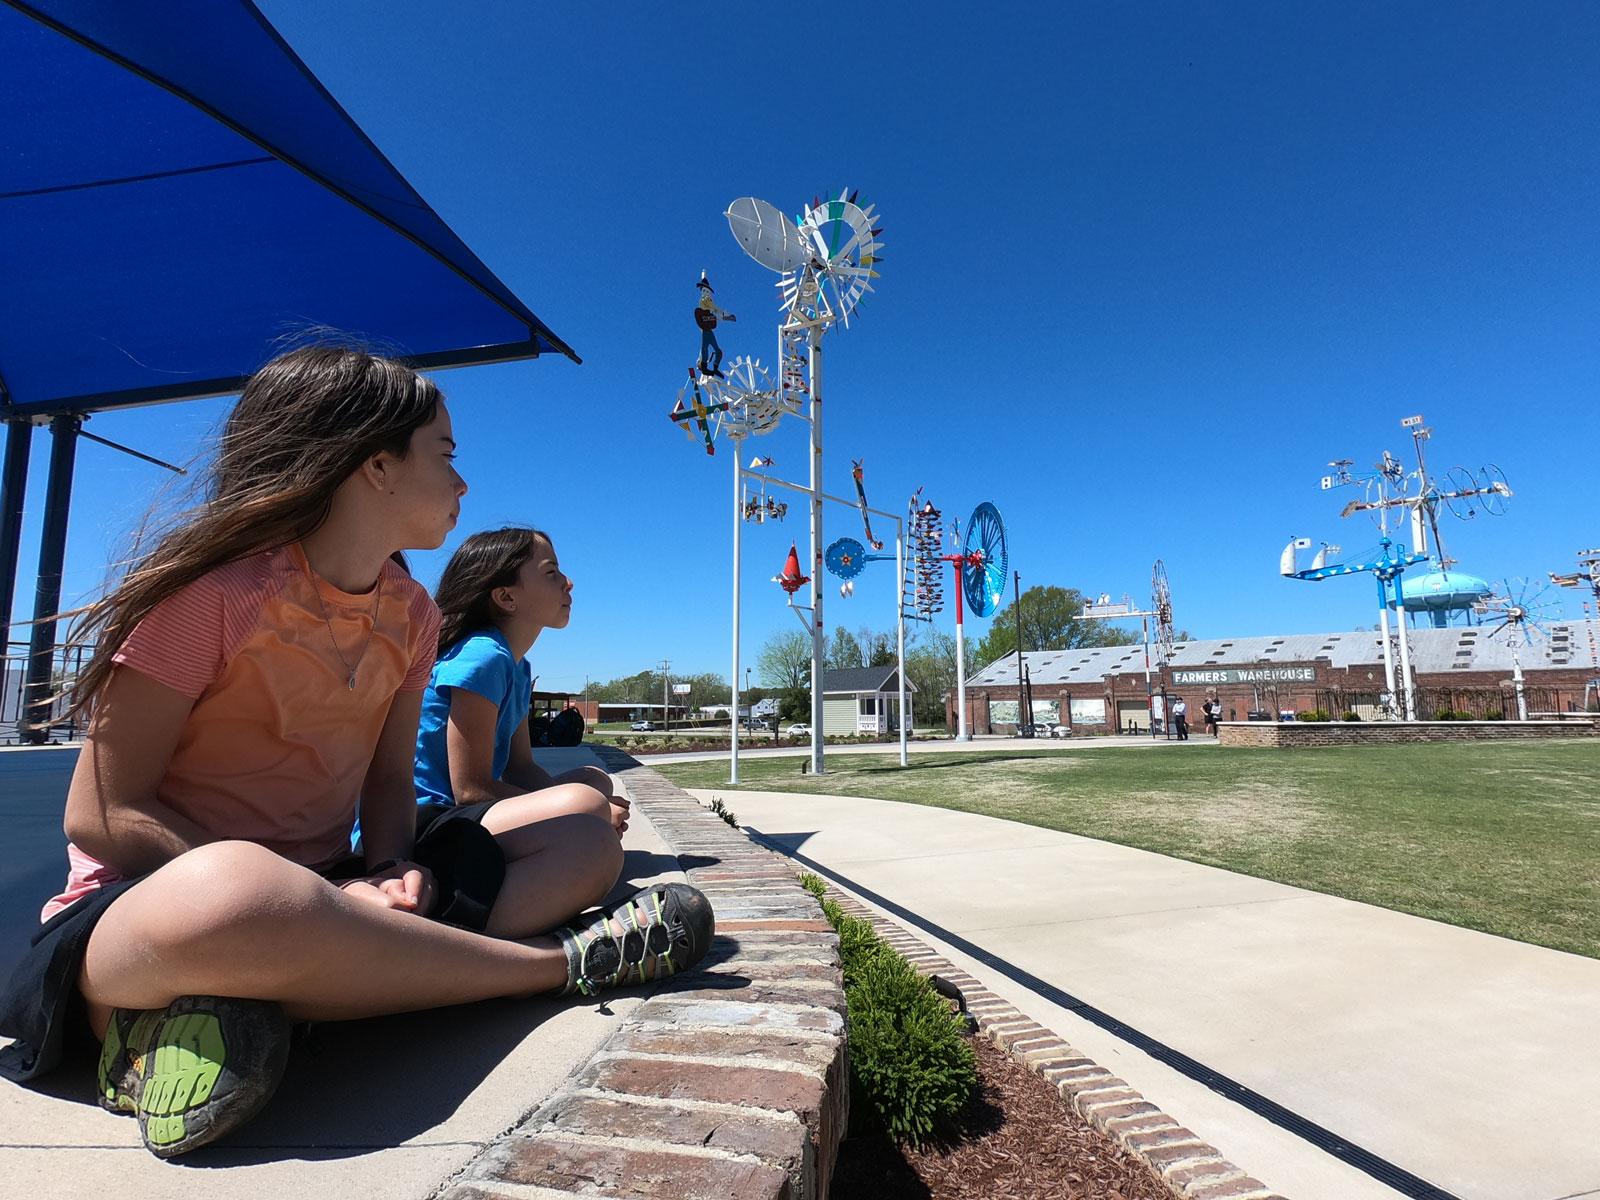 Two girls sitting in Vollis Simpson Whirligig Park, Wilson, North Carolina